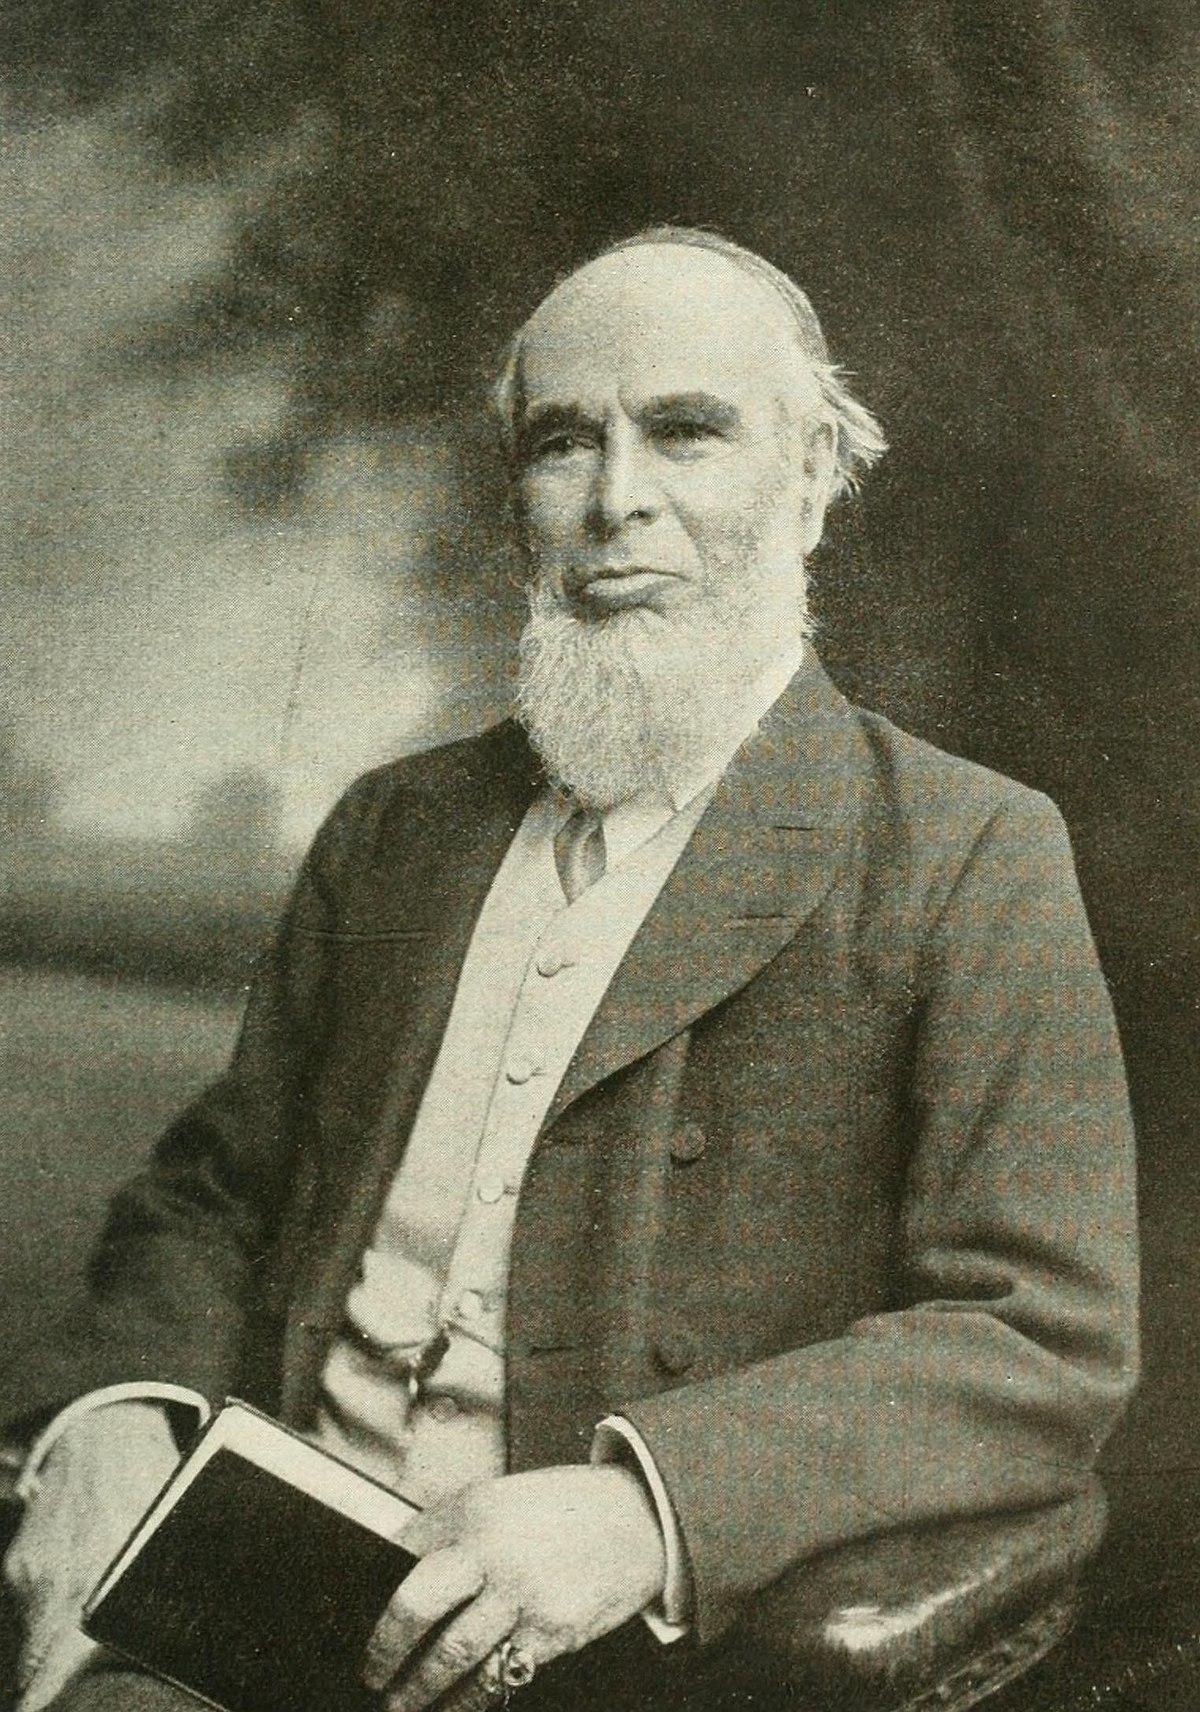 Leonard Courtney, 1st Baron Courtney of Penwith - Wikipedia